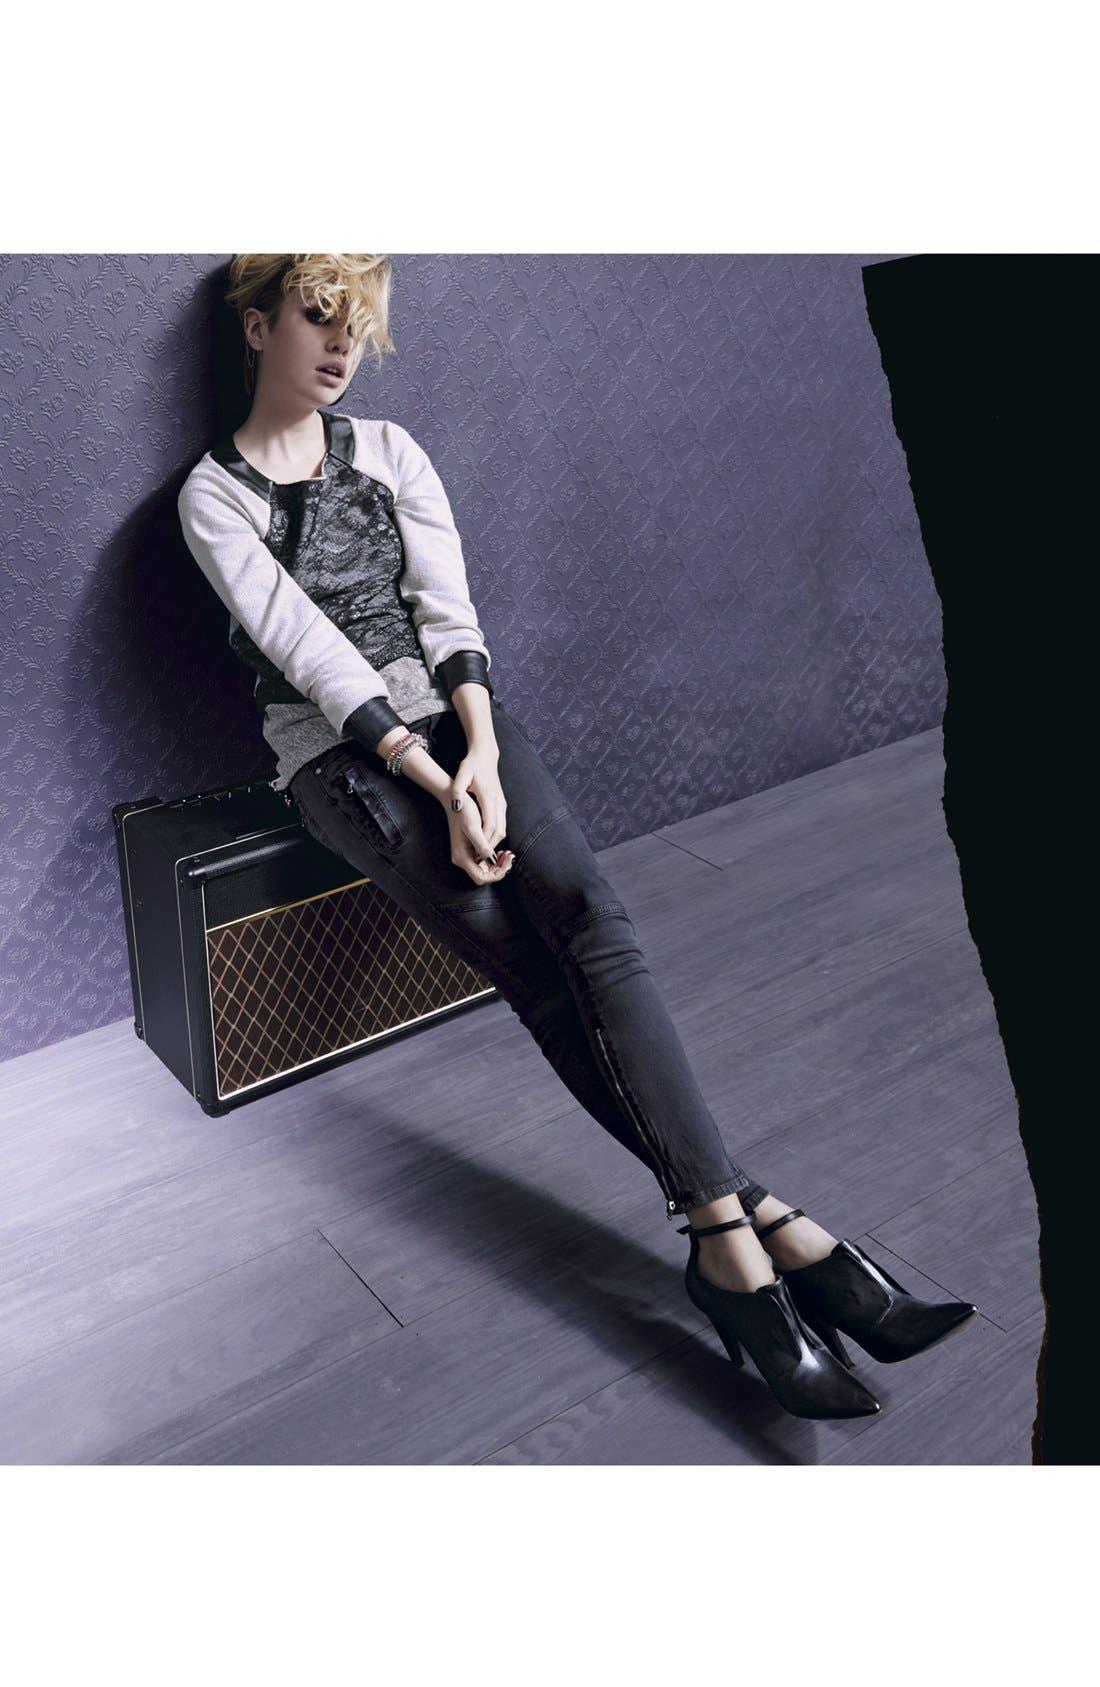 Alternate Image 1 Selected - Robbi & Nikki Sweatshirt & Paige Denim Jeans